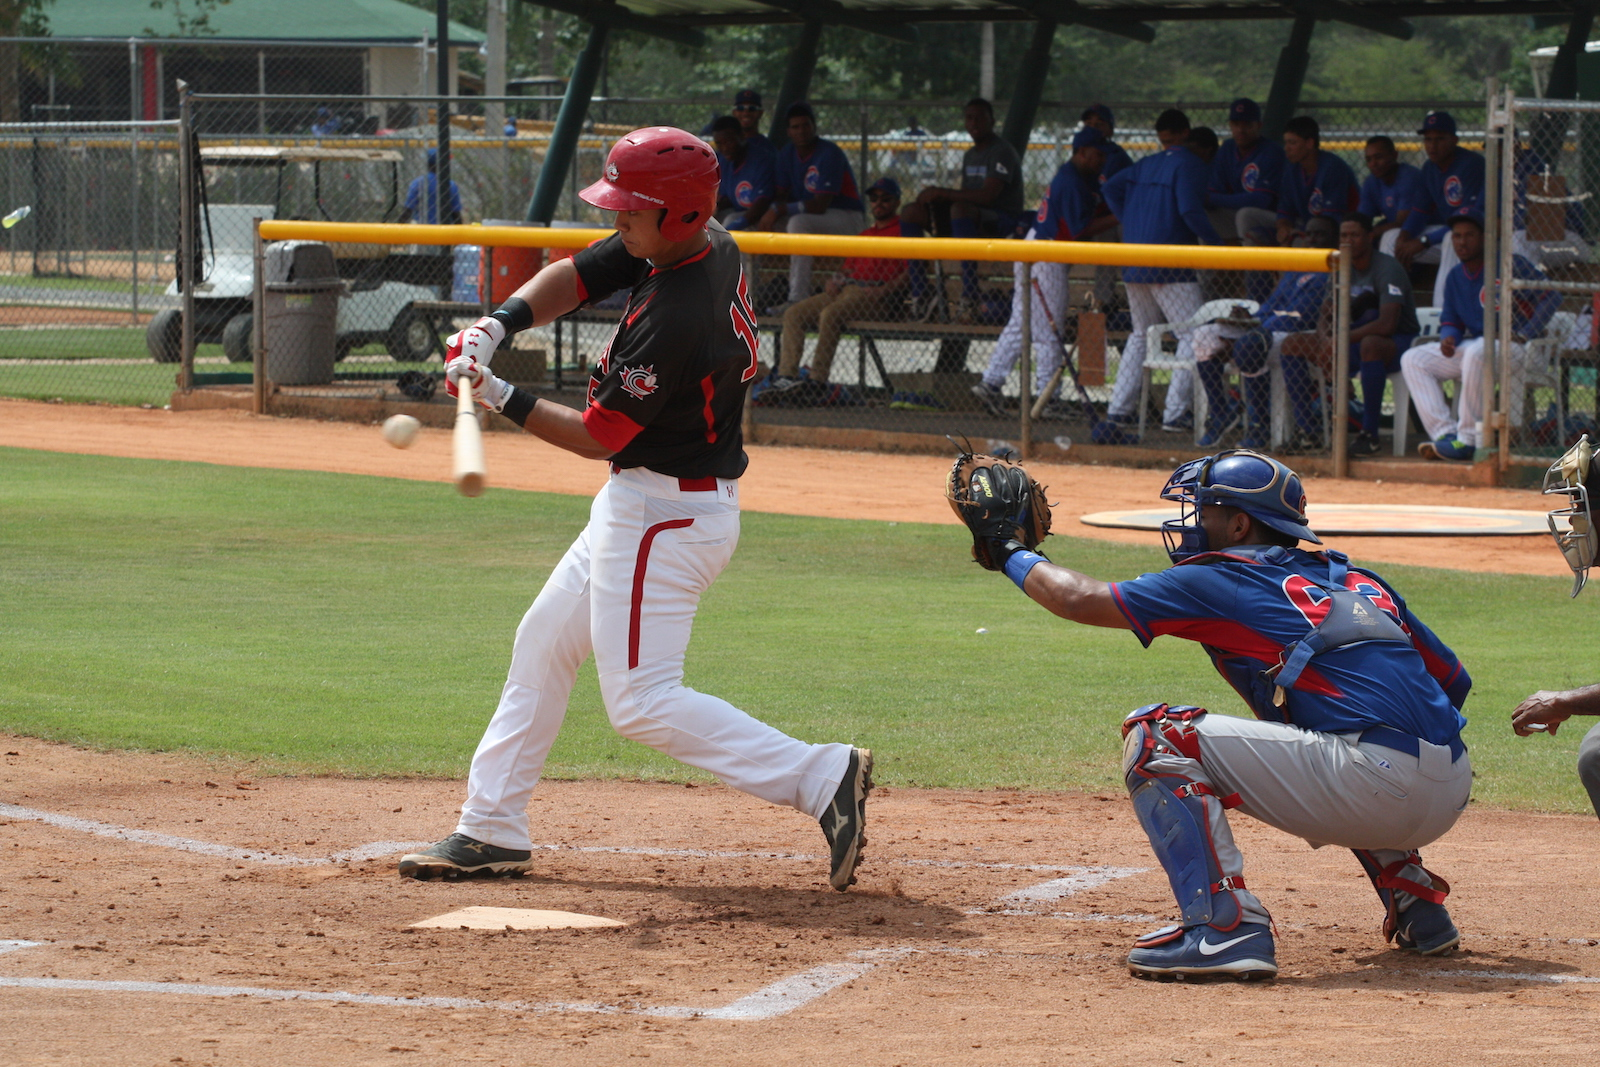 Baseball Canada Announces 2015 Junior National Team Selection Camp Roster